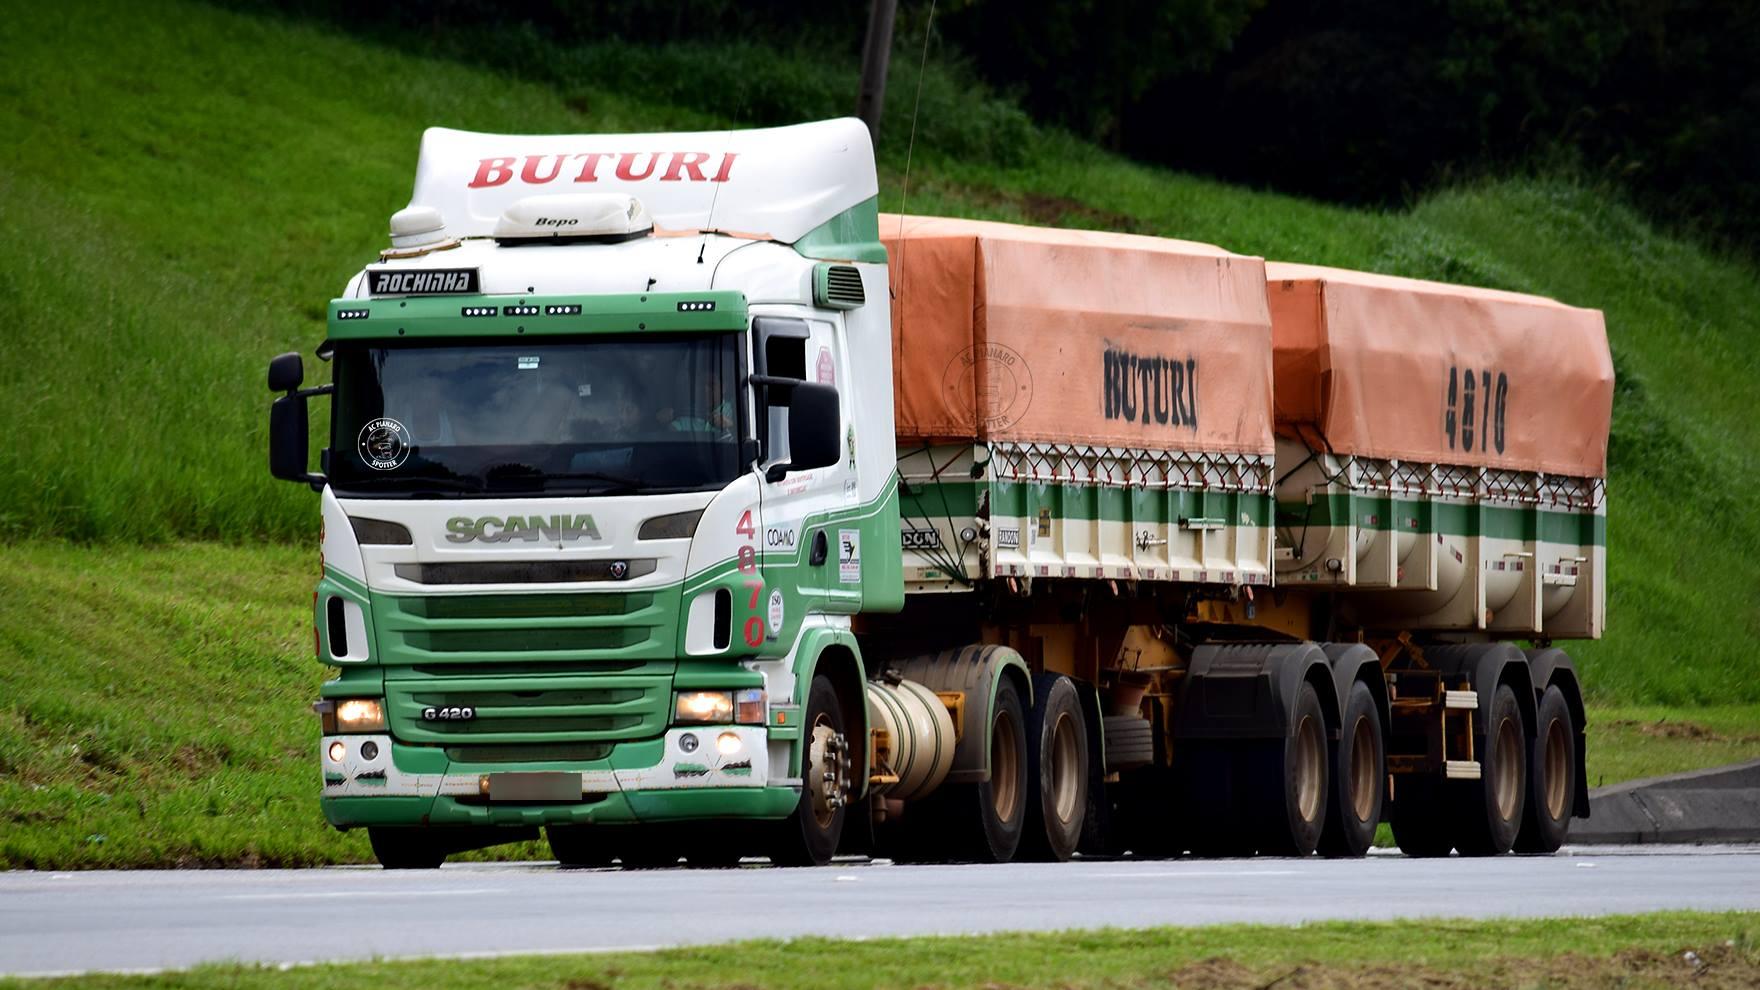 Scania-Brasil-G-420-6x2-da-Buturi-Transportes